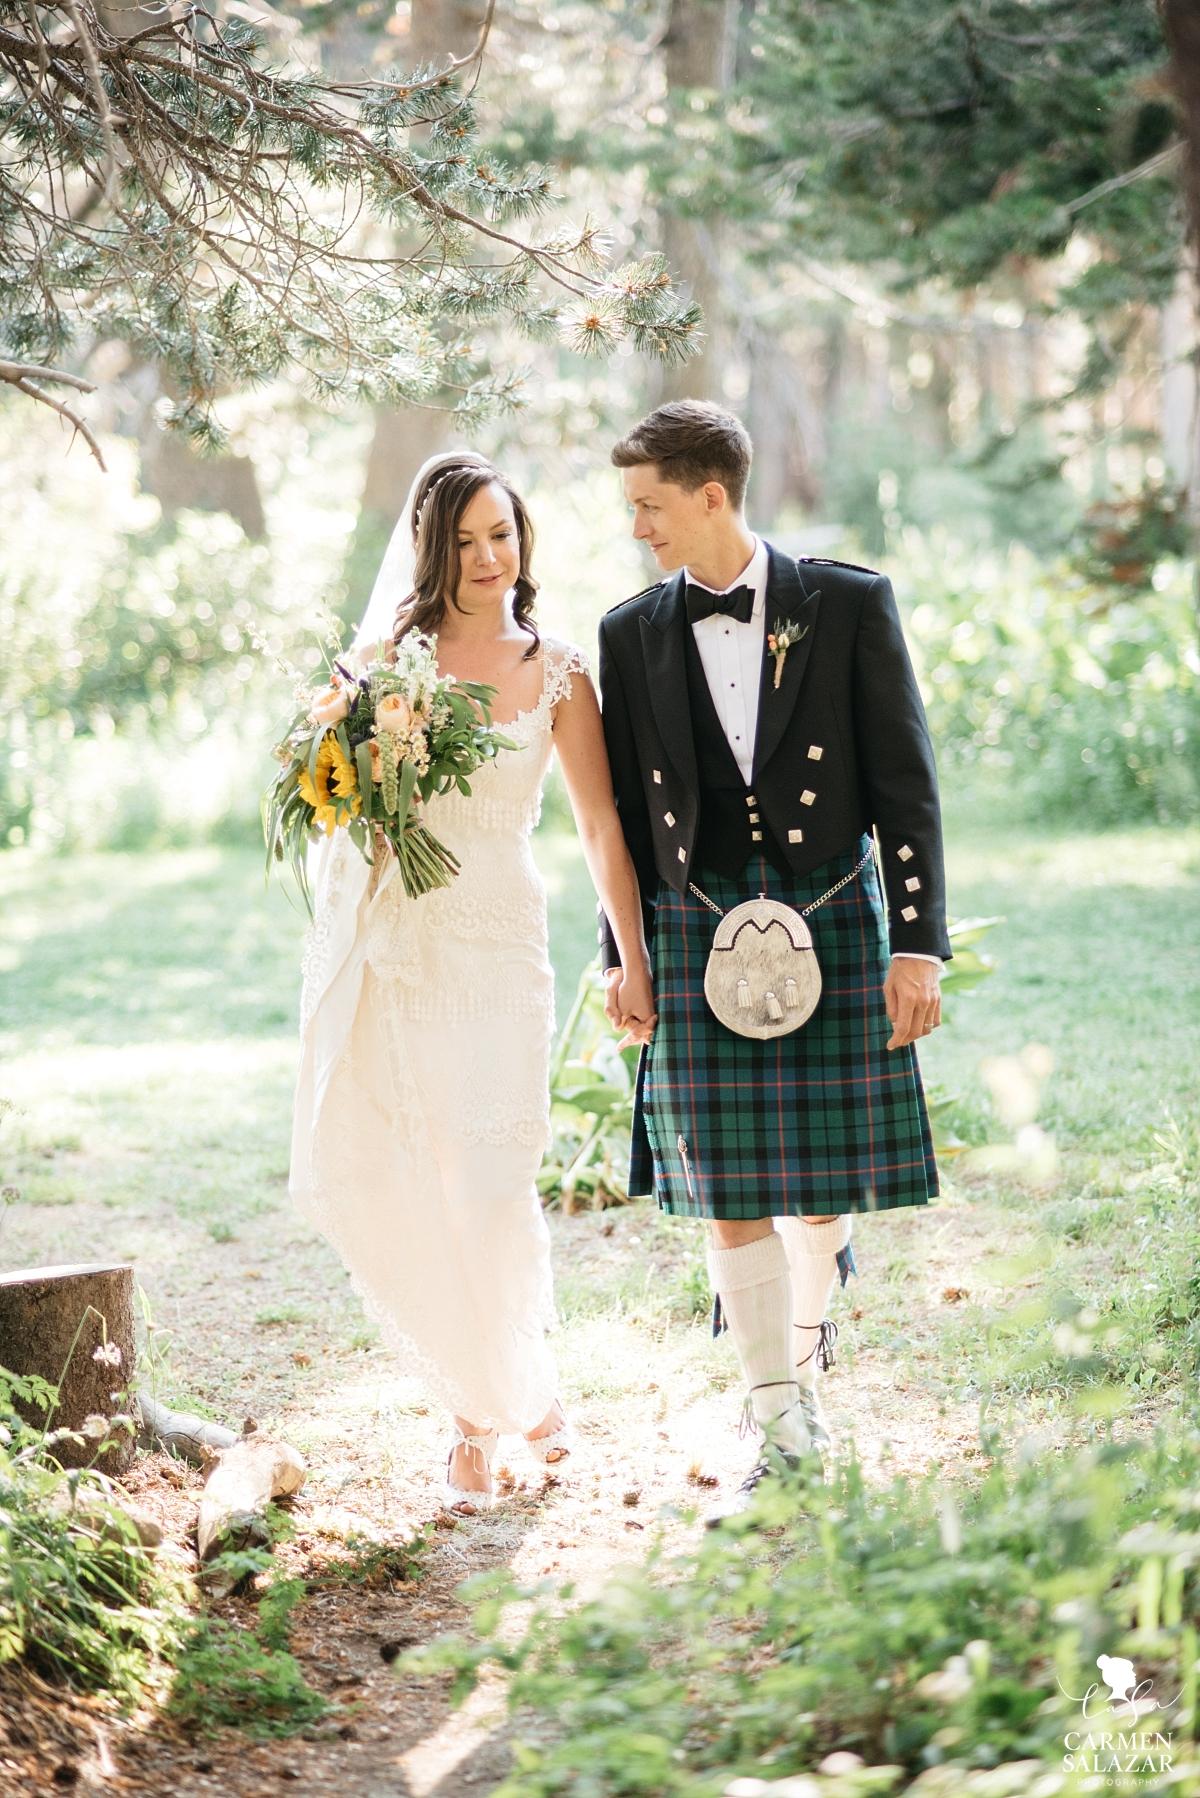 Rustic Scottish themed wedding in Tahoe - Carmen Salazar